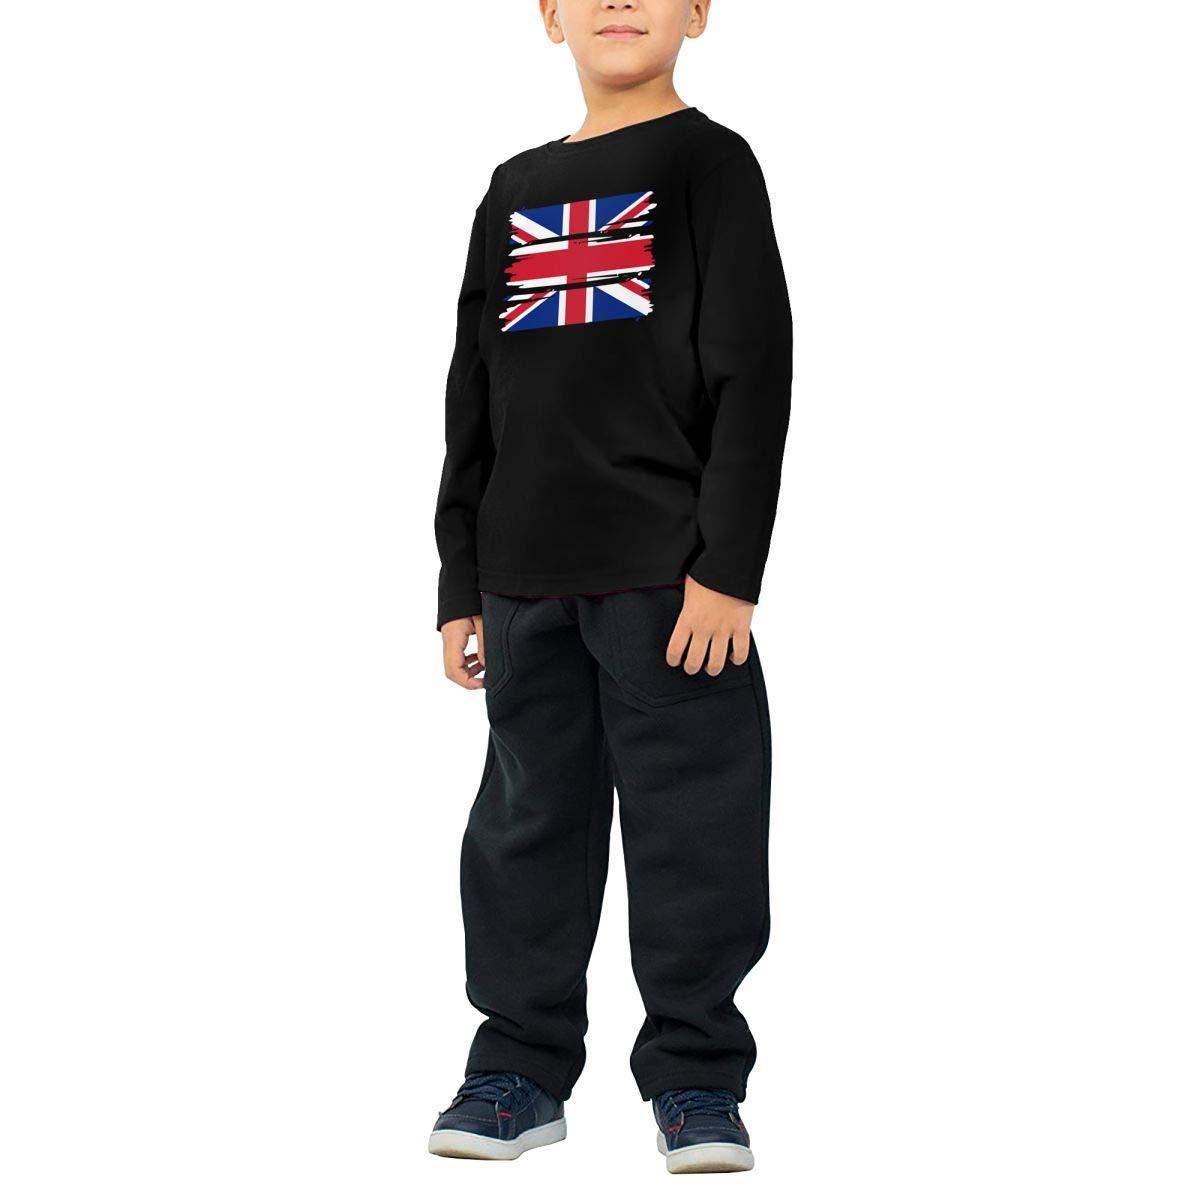 CERTONGCXTS Little Boys British Flag ComfortSoft Long Sleeve Shirt